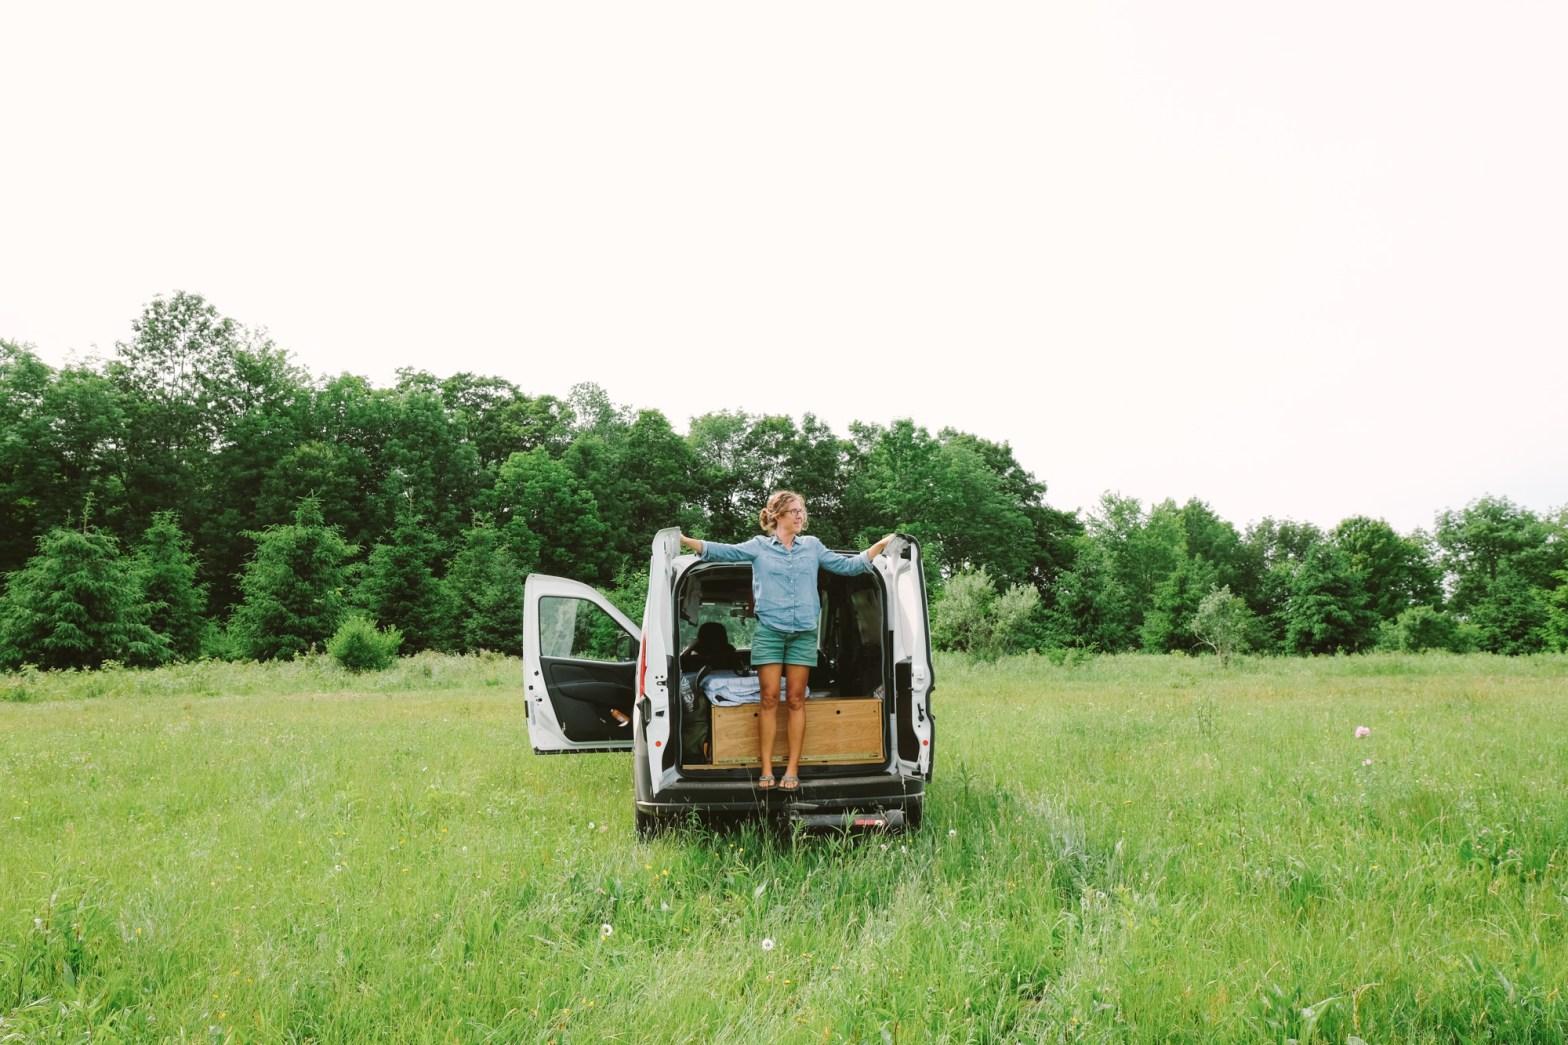 Caroline Whatley standing in the back of an open Ram Promaster camper van